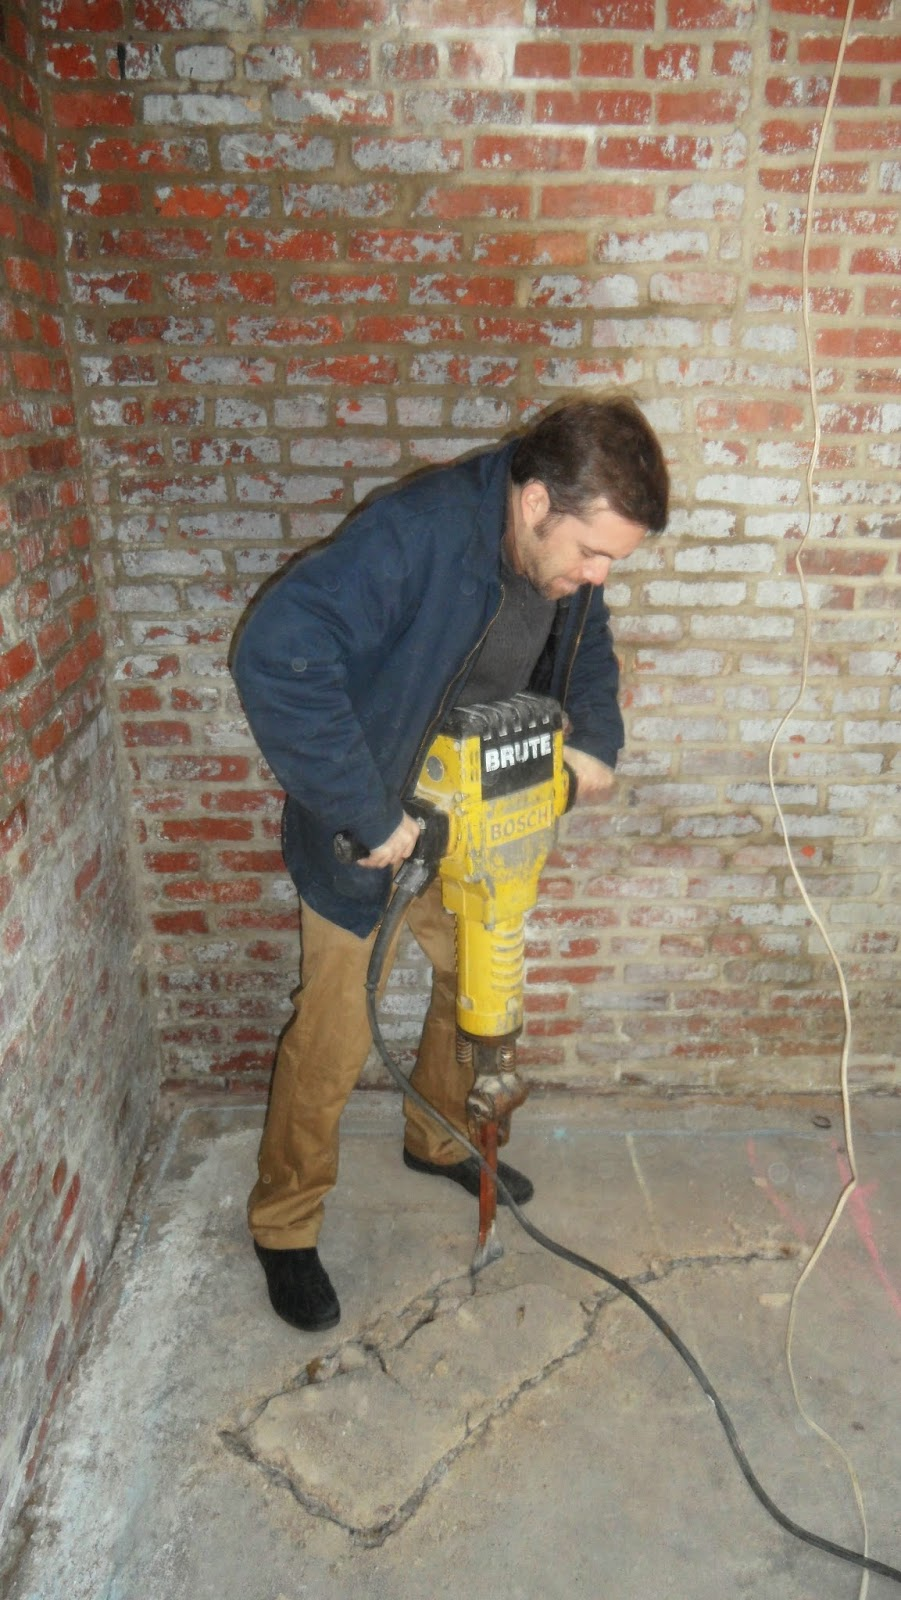 07-Removing-uneven-concrete-imgur-Storage-Unit-Renovation-in-Tiny-Architecture-www-designstack-co